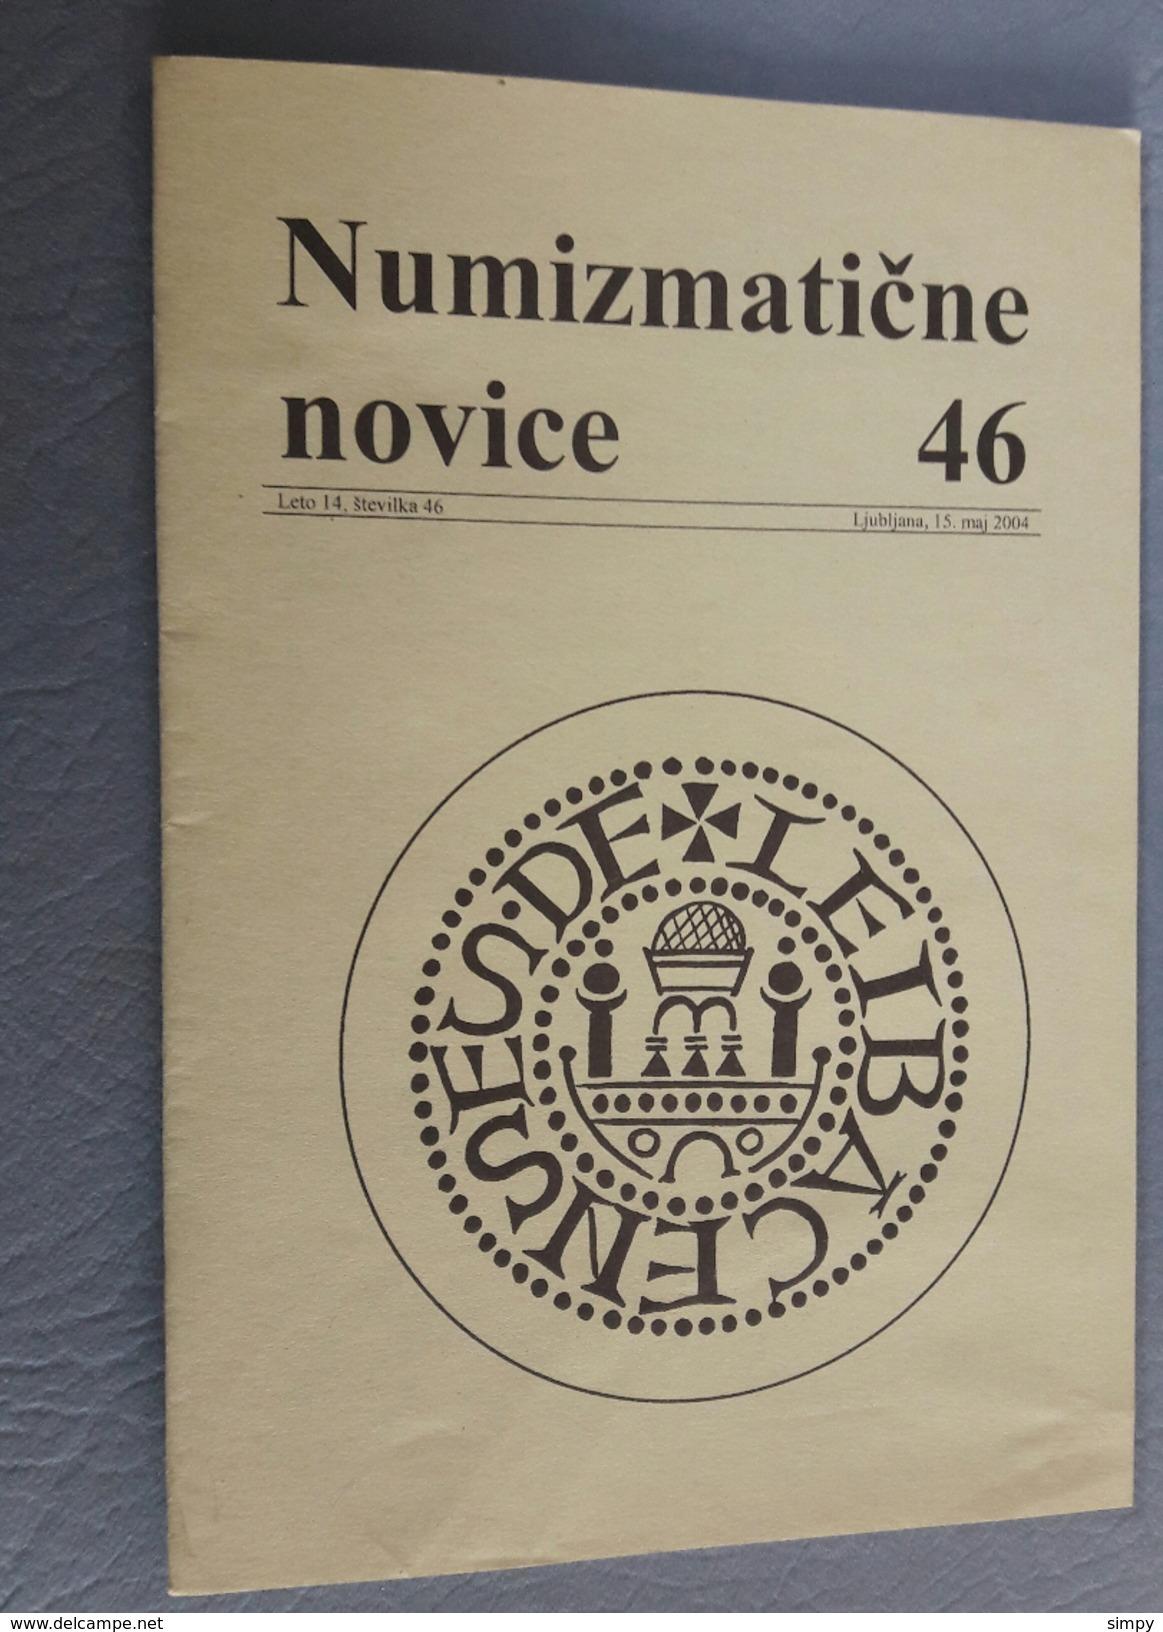 Slovenia Numismatic Bulletin Numizmaticne Novice 46 Ljubljana 2004 - Zeitschriften: Abonnement